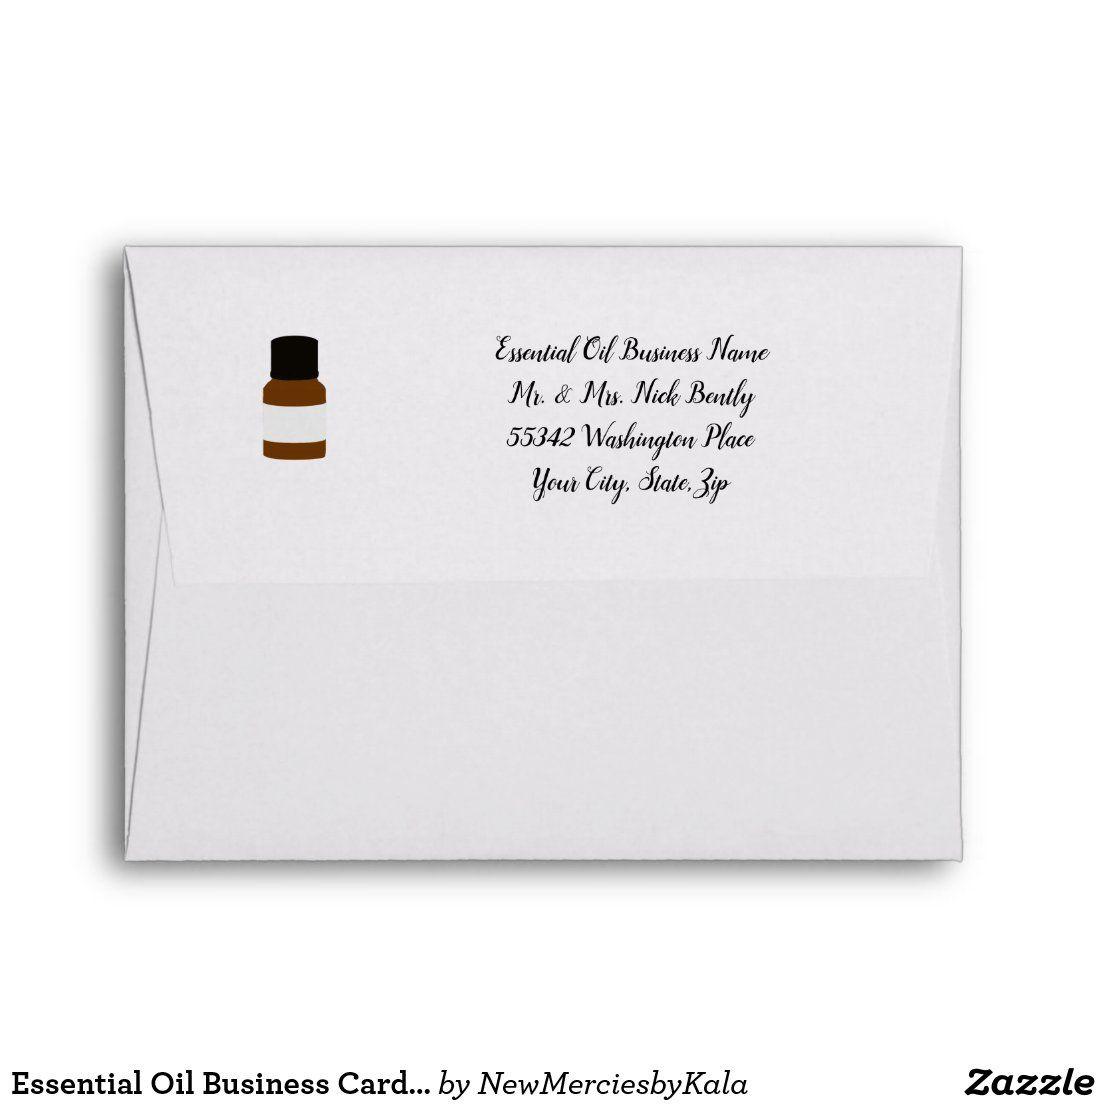 Essential Oil Business Card Envelope Personalized Zazzle Com Essential Oils Business Card Envelopes Custom Printed Envelopes